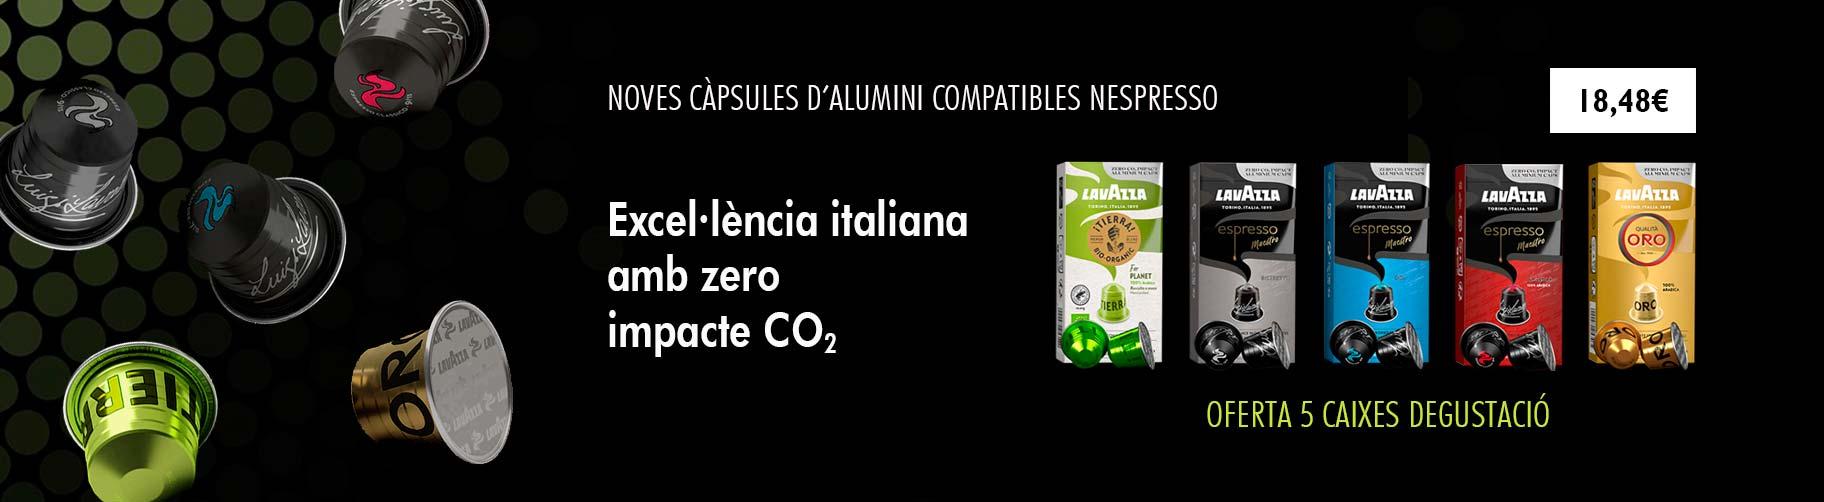 Noves càpsules d'alumini Nespresso